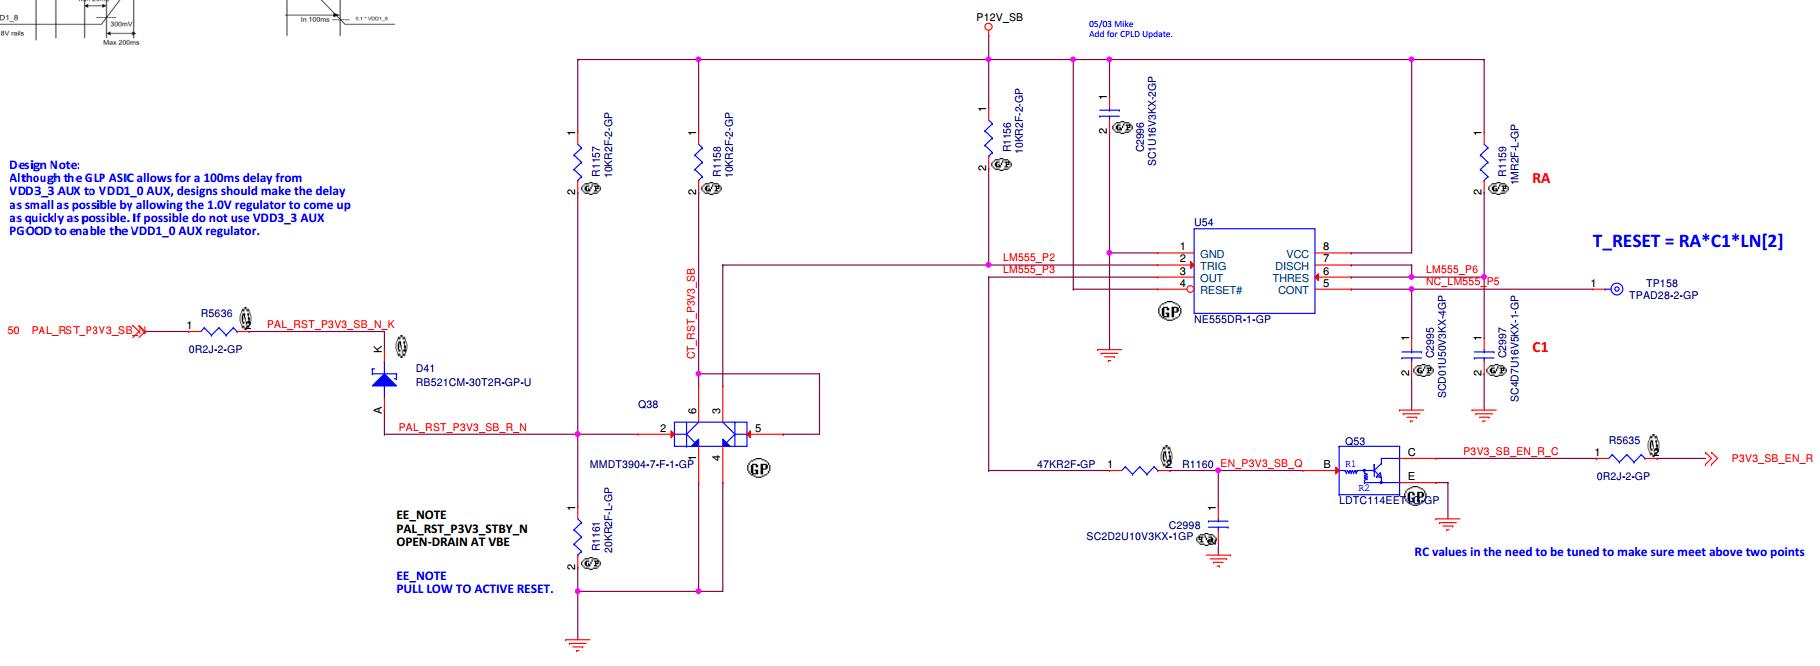 NE555: NE555 schematic review - Clock & timing forum - Clock ... on lm3915 schematic, lm358 schematic, doorbell circuit schematic, lm317 schematic, breadboard schematic, capacitor schematic, audio schematic, lm741 schematic, telephone schematic, motor schematic, emergency light schematic, bicycle schematic, inductor schematic, capacitance meter schematic, max232 schematic,